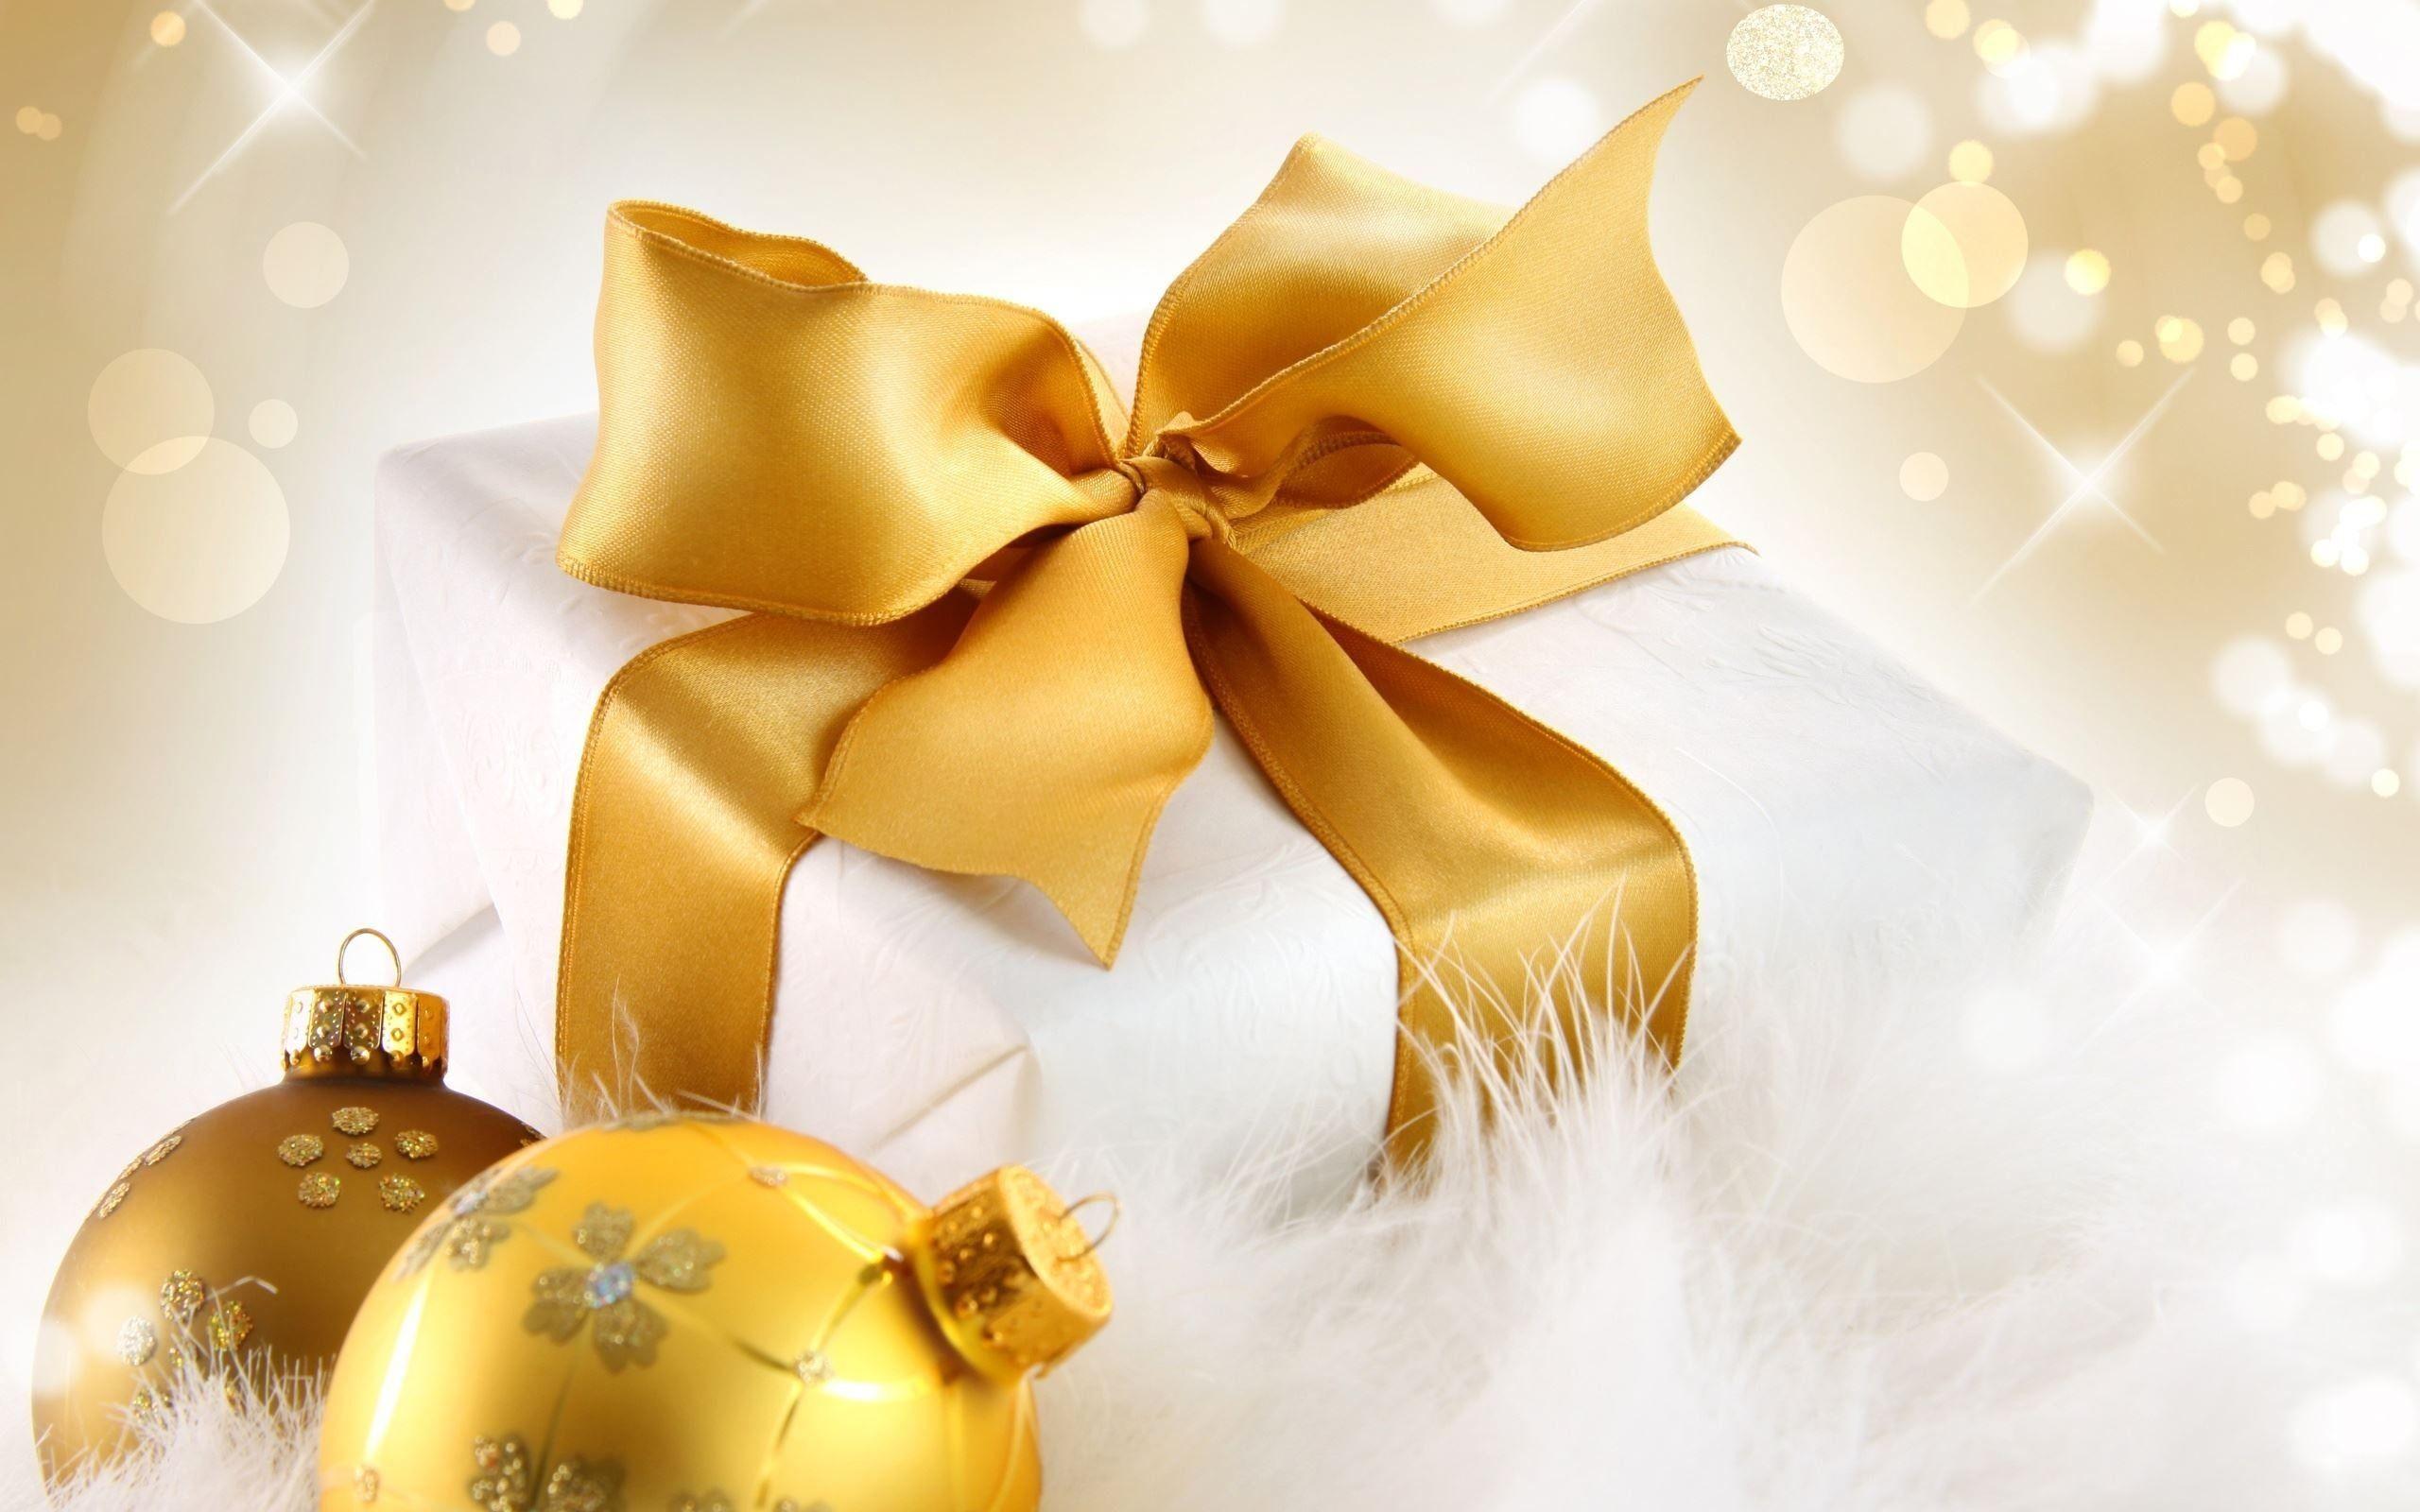 Christmas Gift Boxes Wallpaper (09)